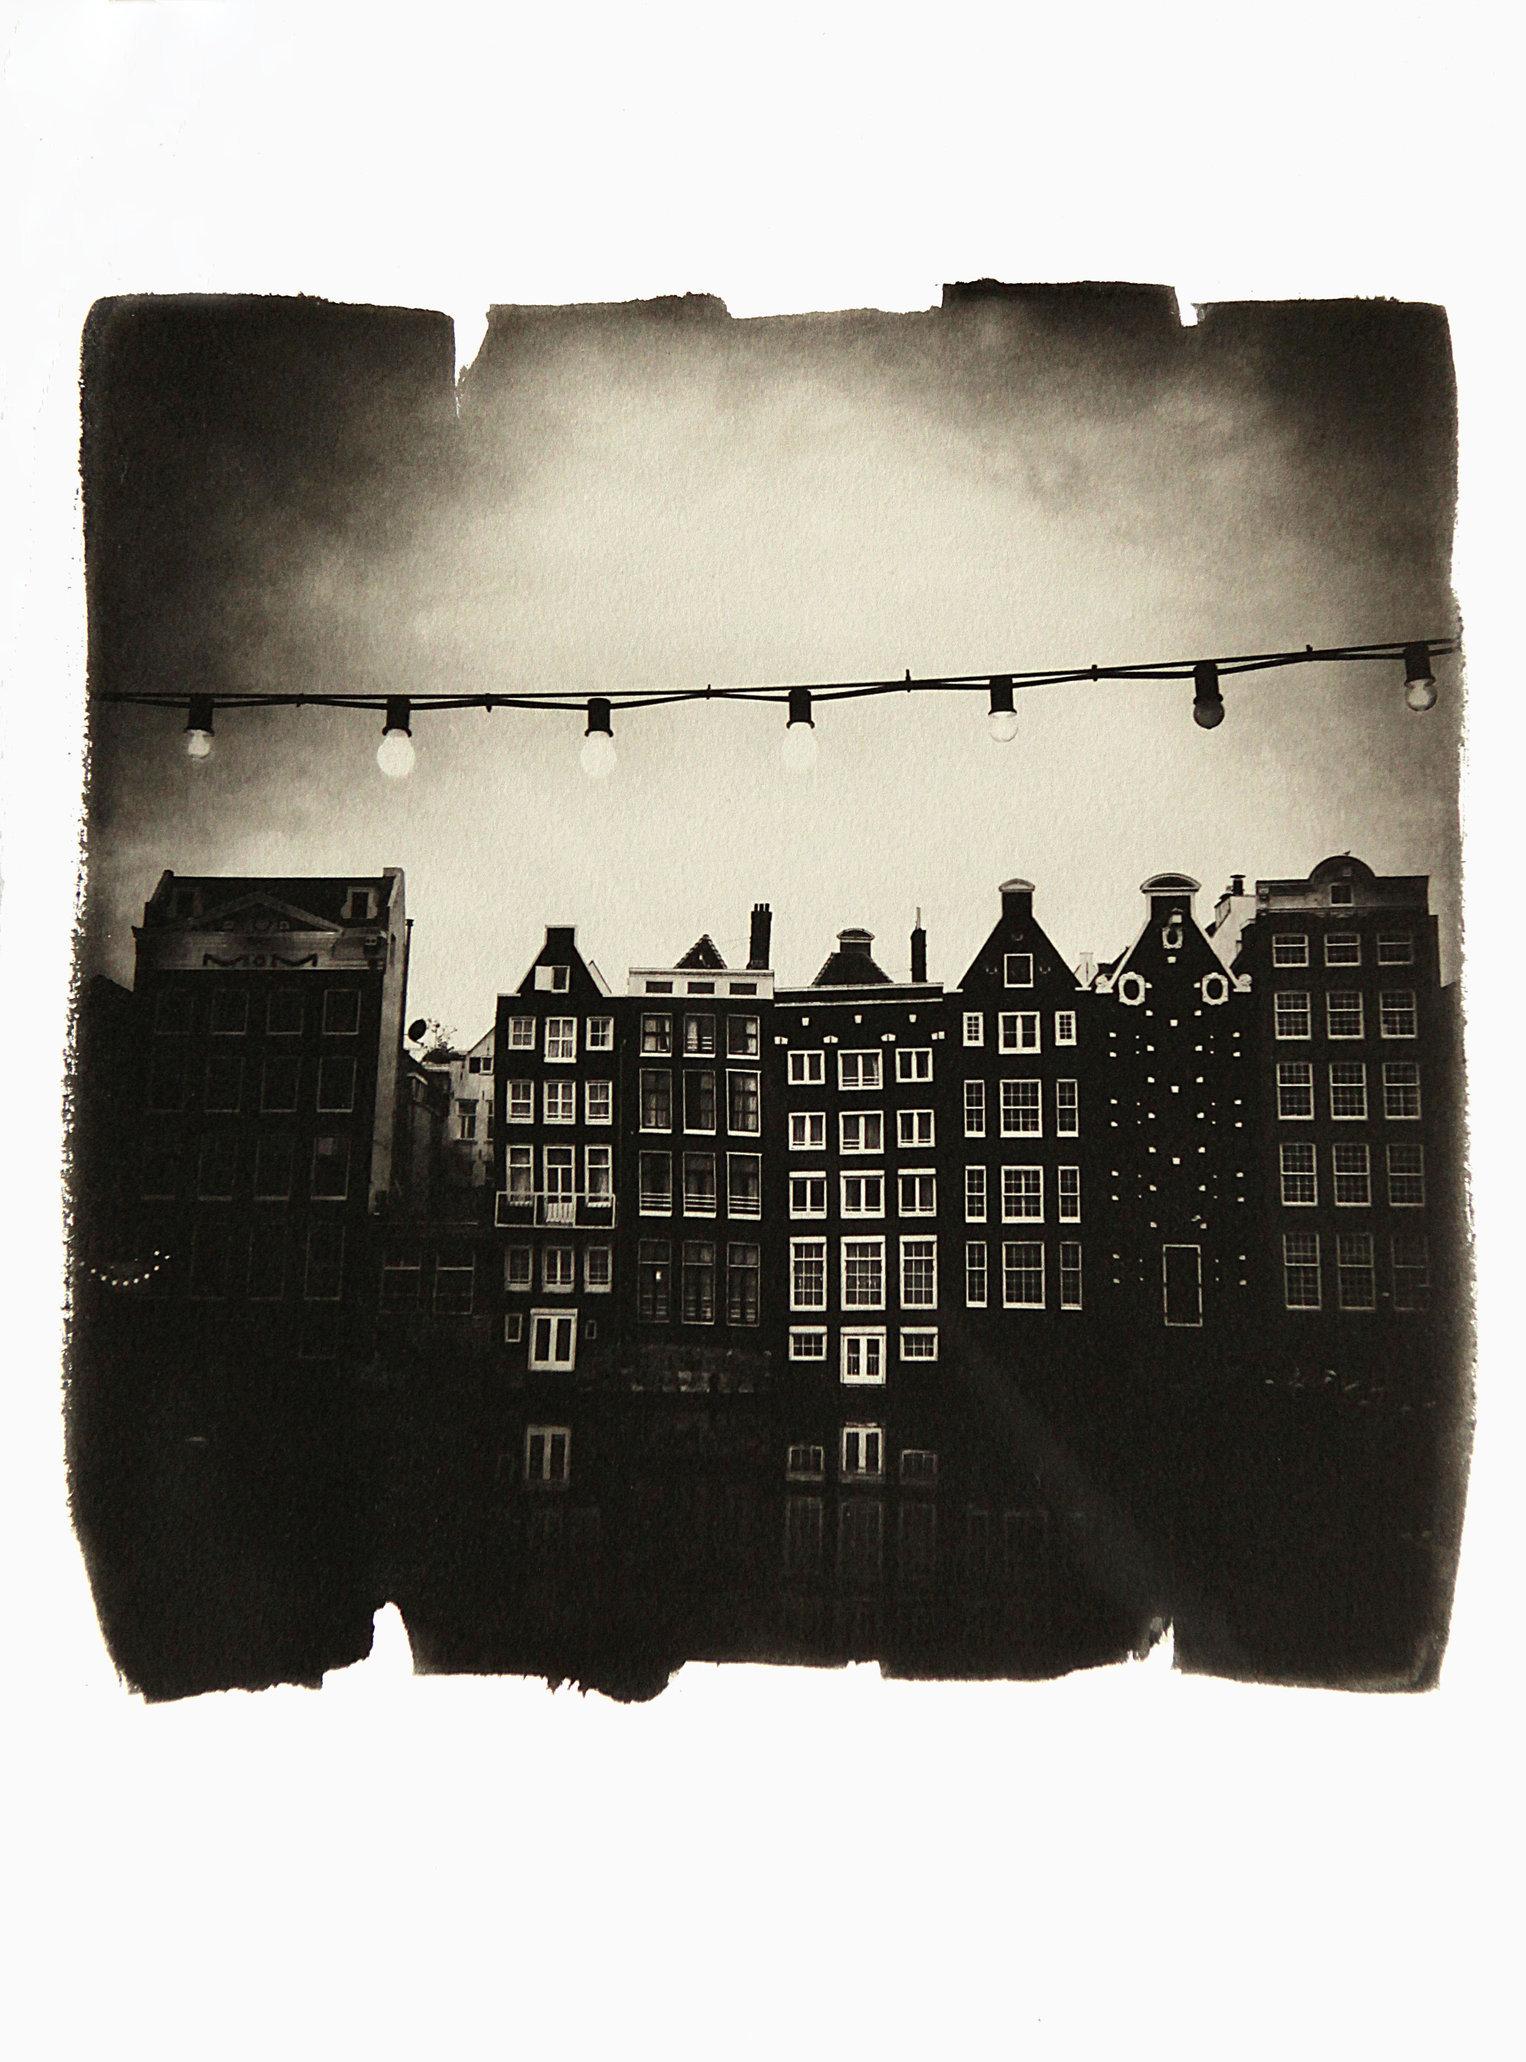 AMSTERDAM-Palladium-01.JPG